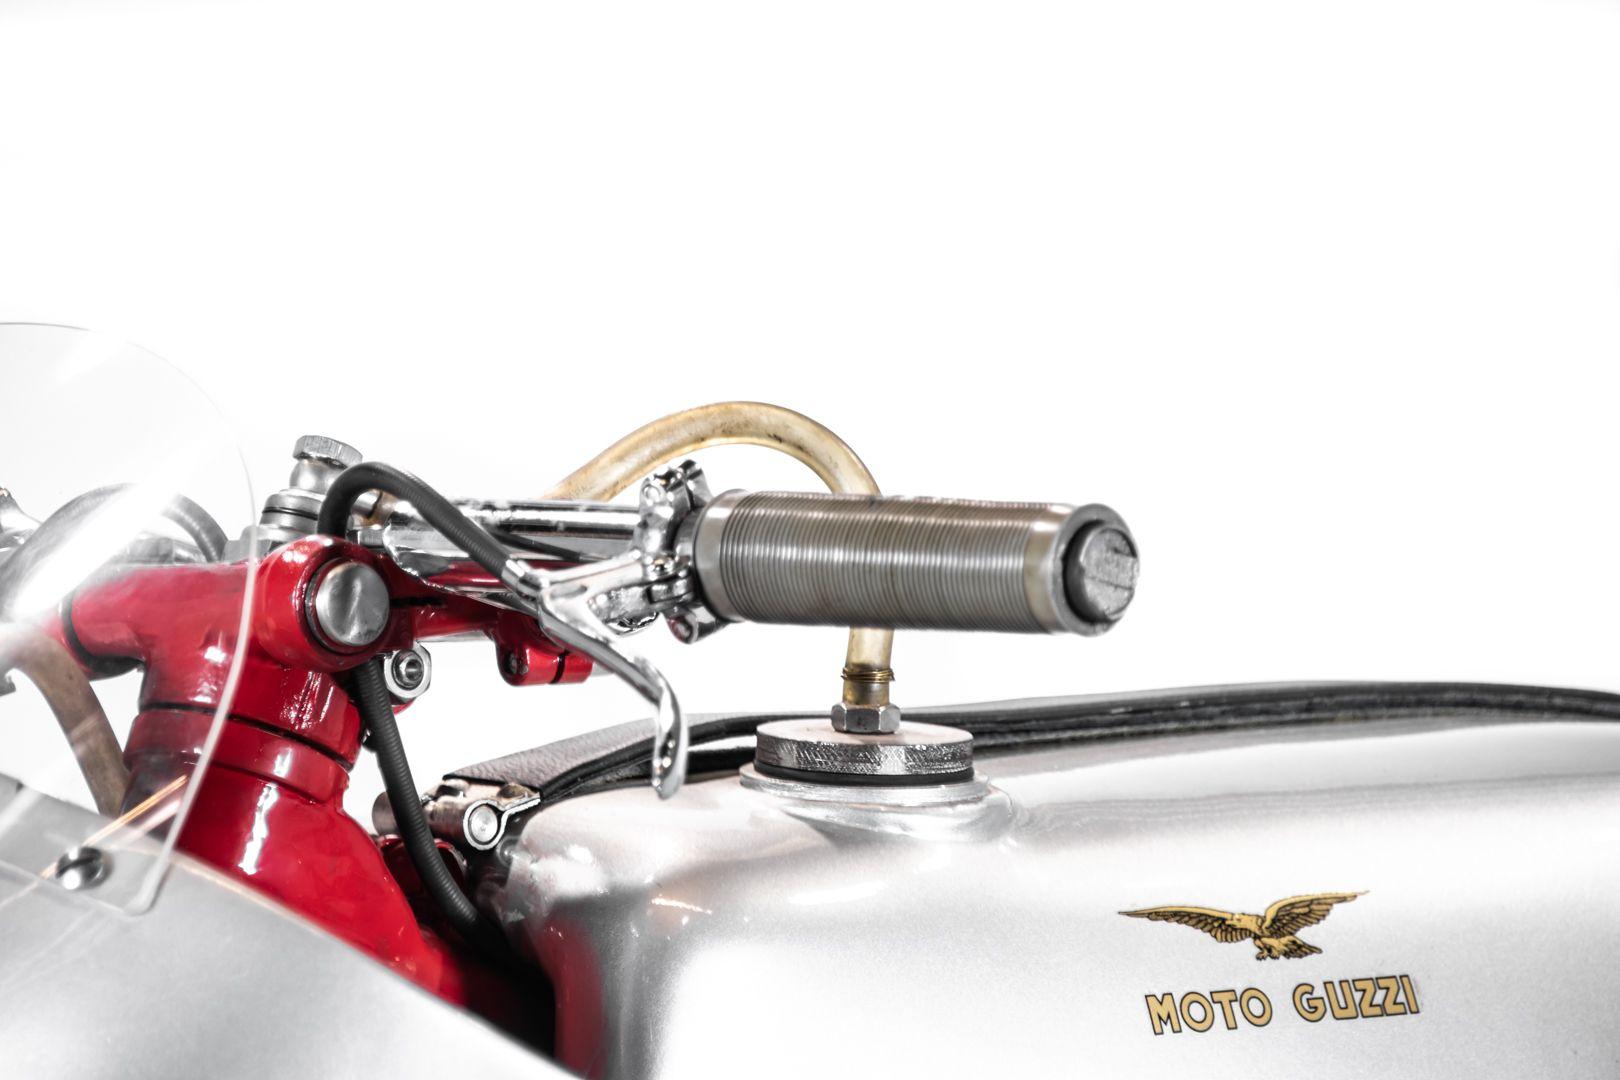 1930 Moto Guzzi 250 SS Corsa 77202